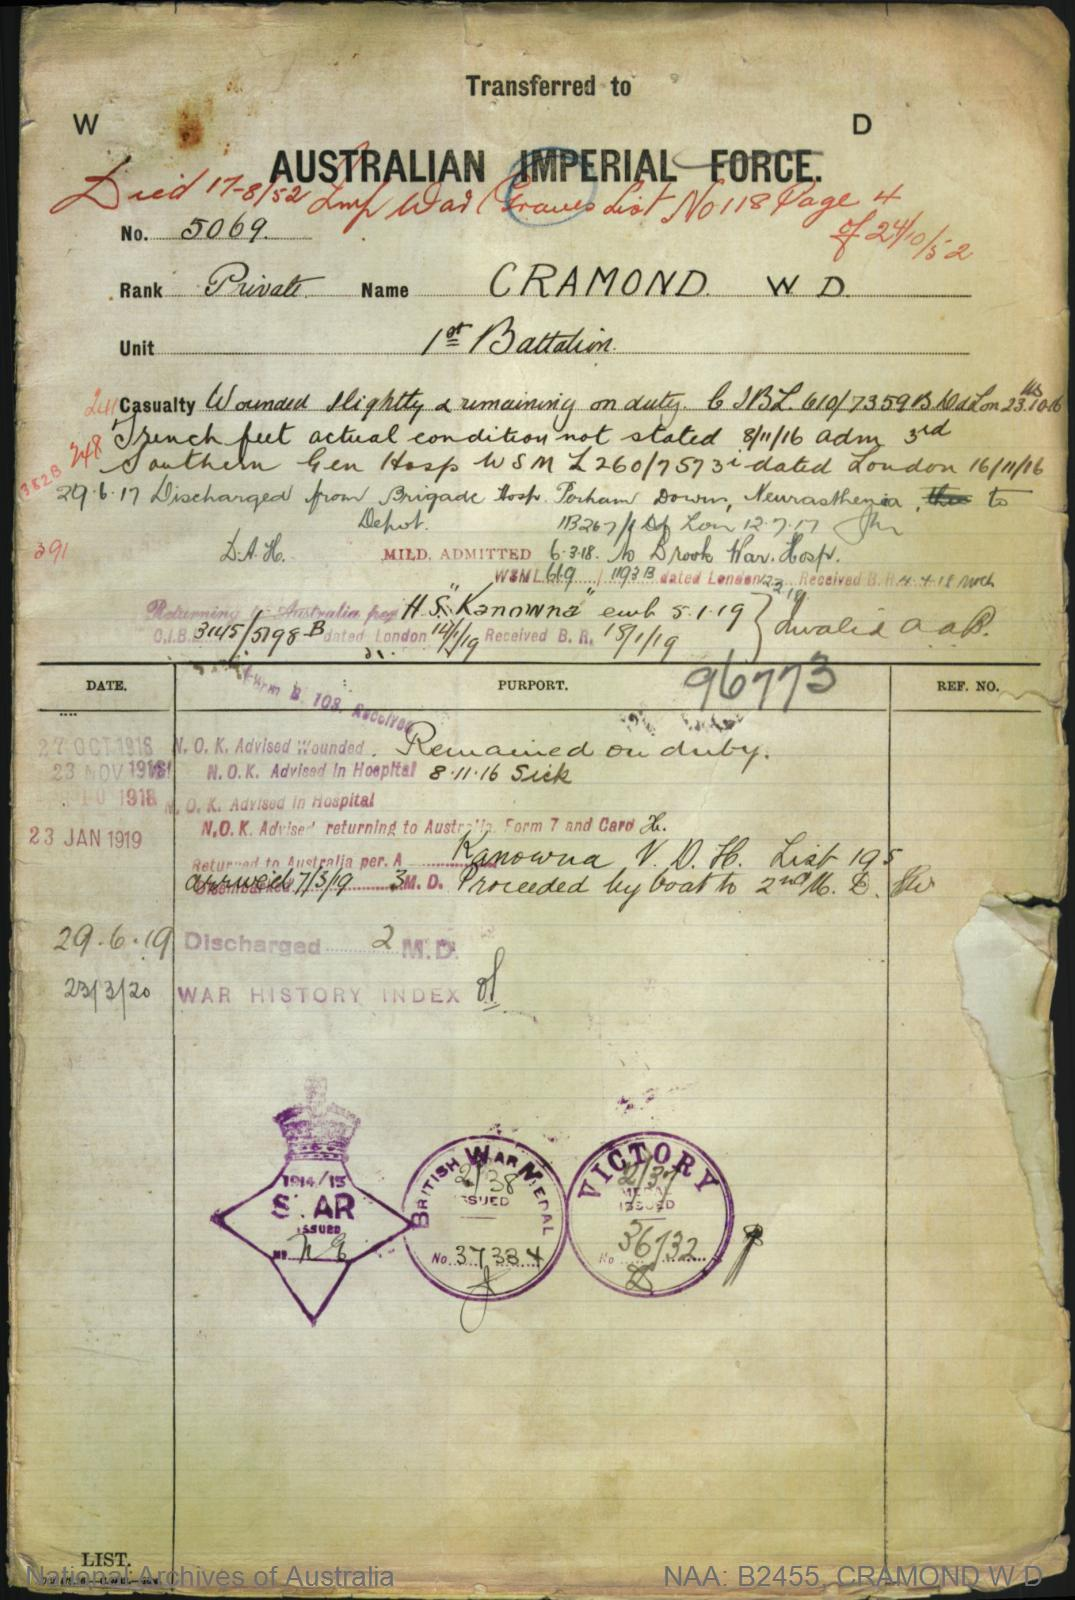 Cramond William David : SERN 5069 : POB Jamberoo NSW : POE Nowra NSW : NOK M Cramond Mary Ann